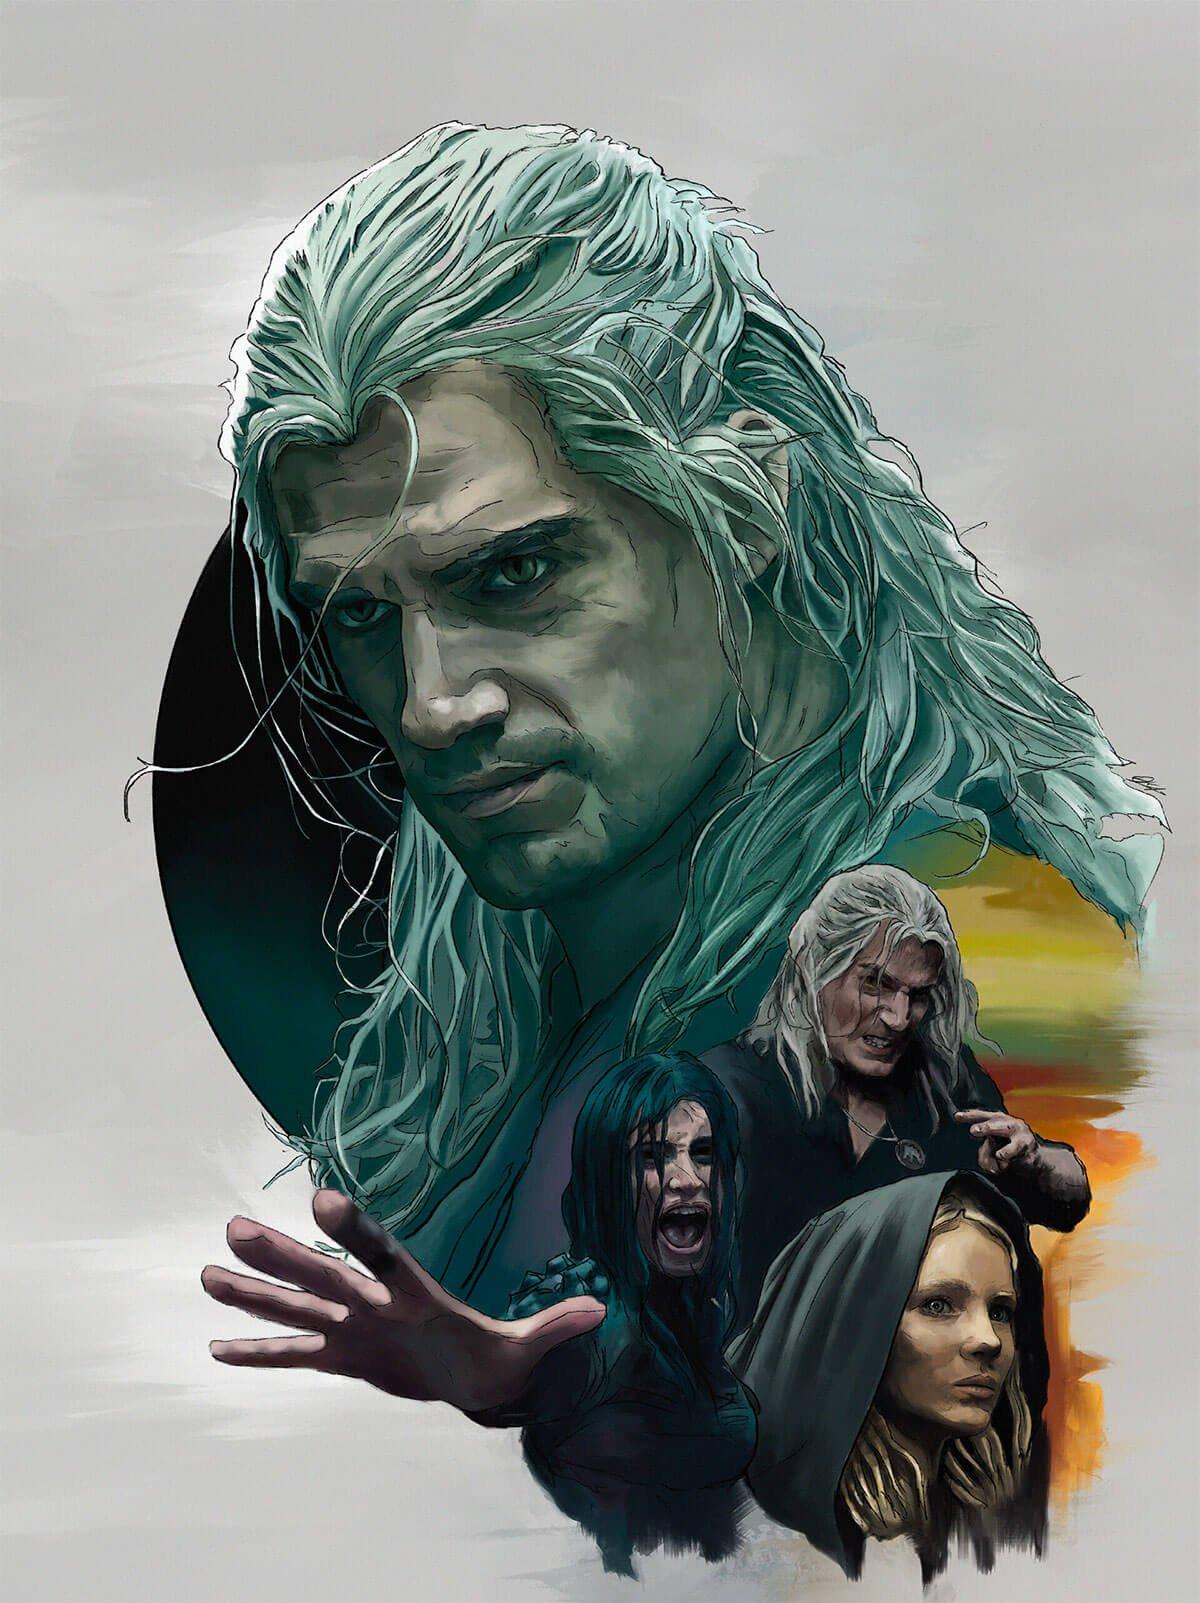 The Witcher Fan Art by Dávid Kuriško